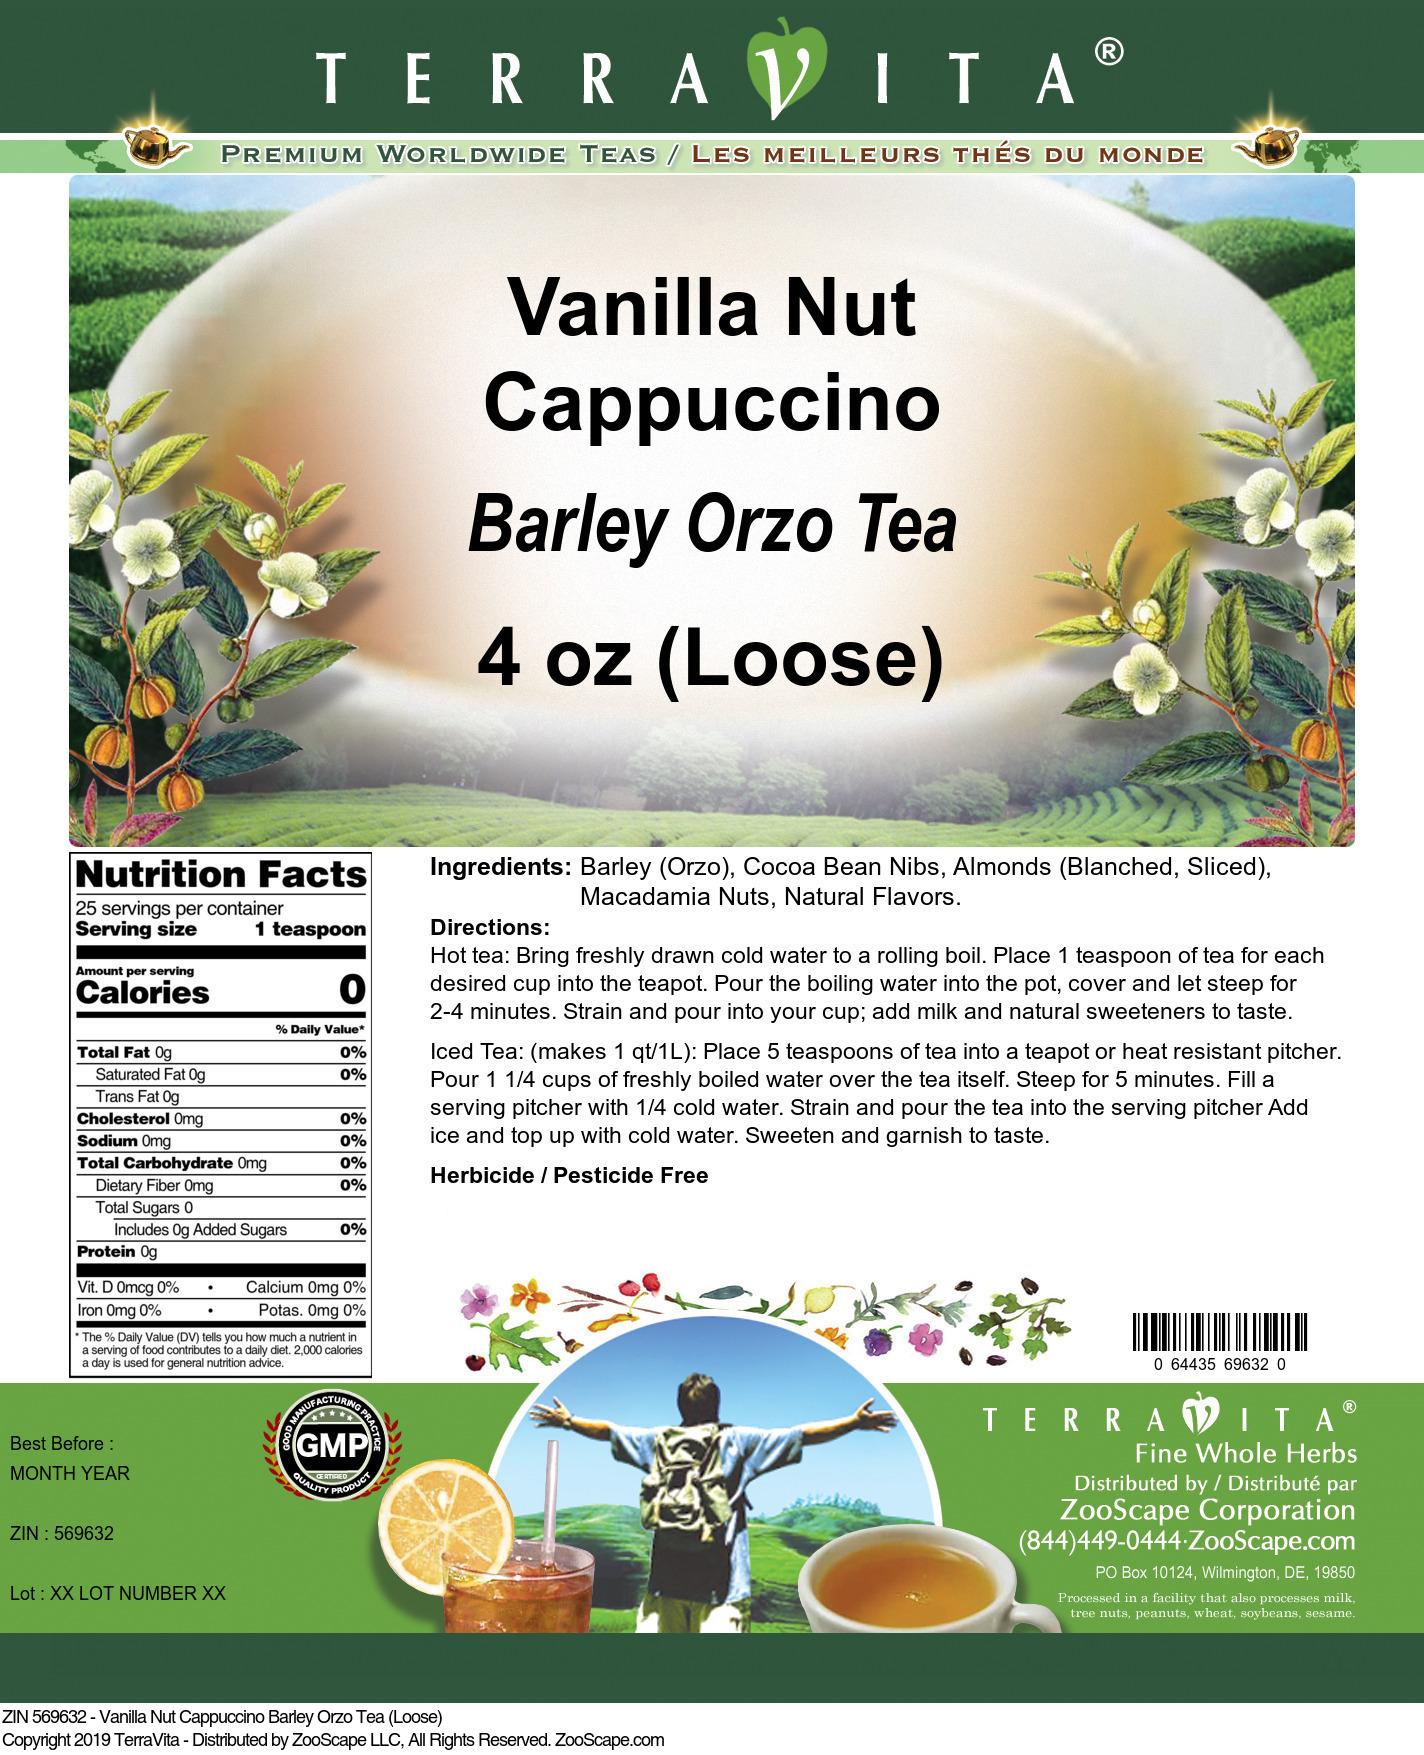 Vanilla Nut Cappuccino Barley Orzo